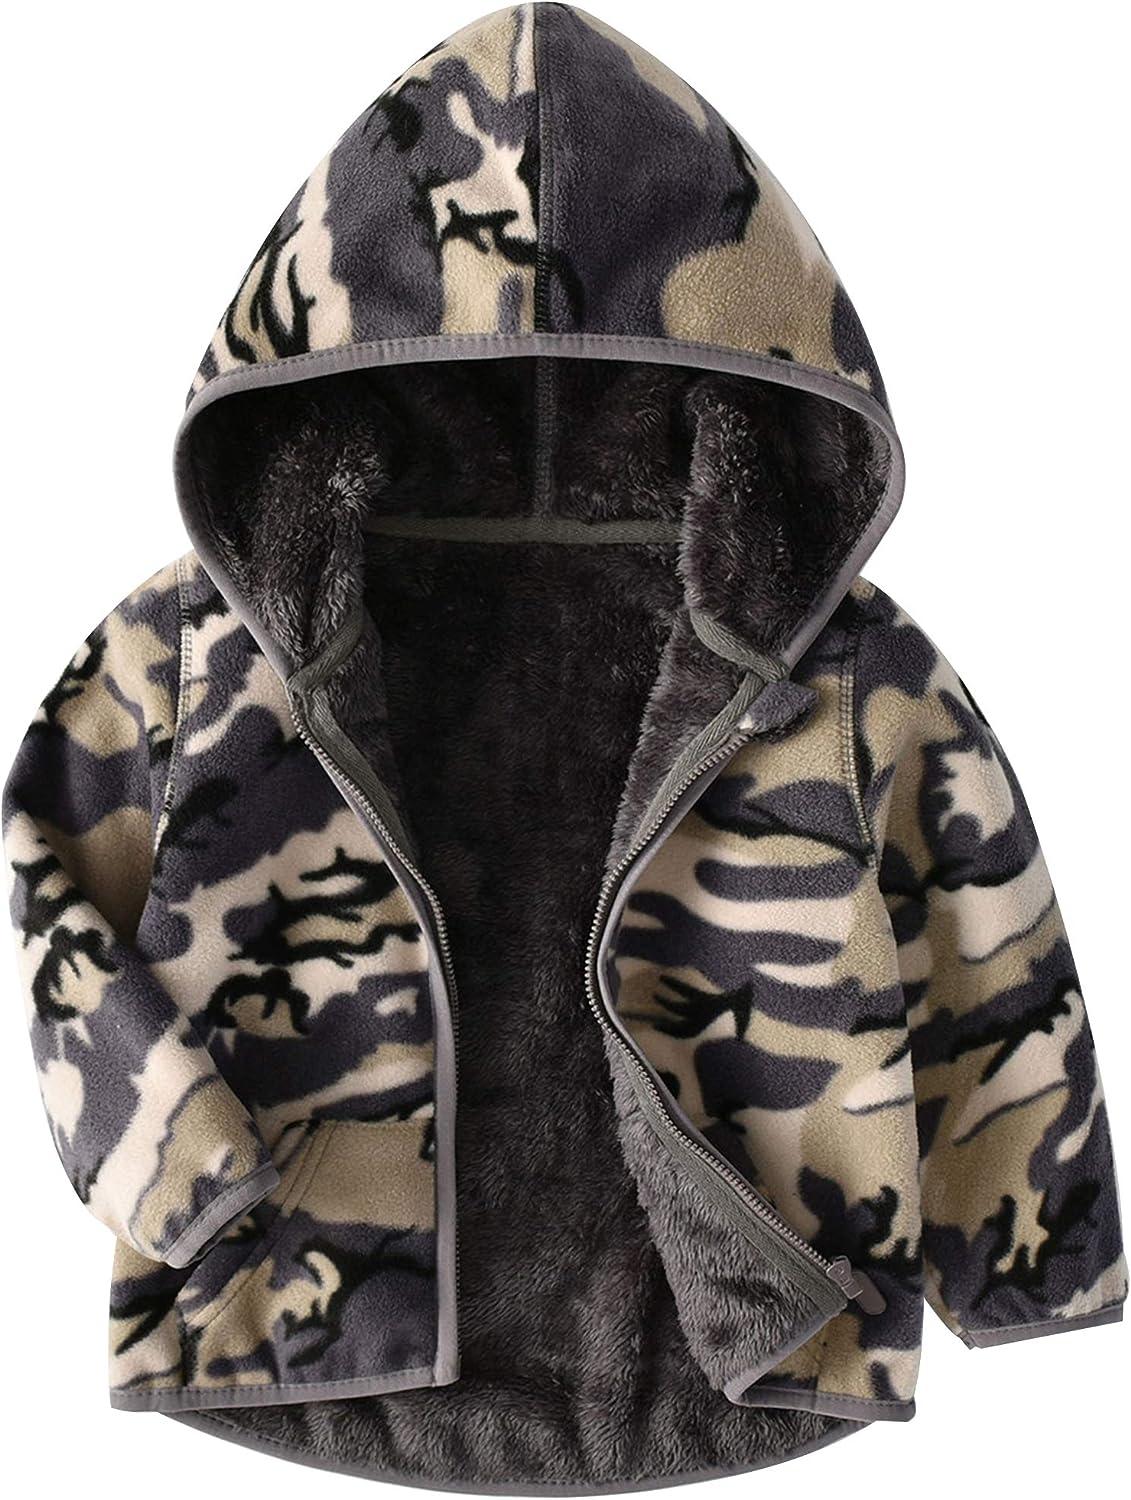 Hiheart Girls Polar Fleece Lined Sherpa Jacket with Hood